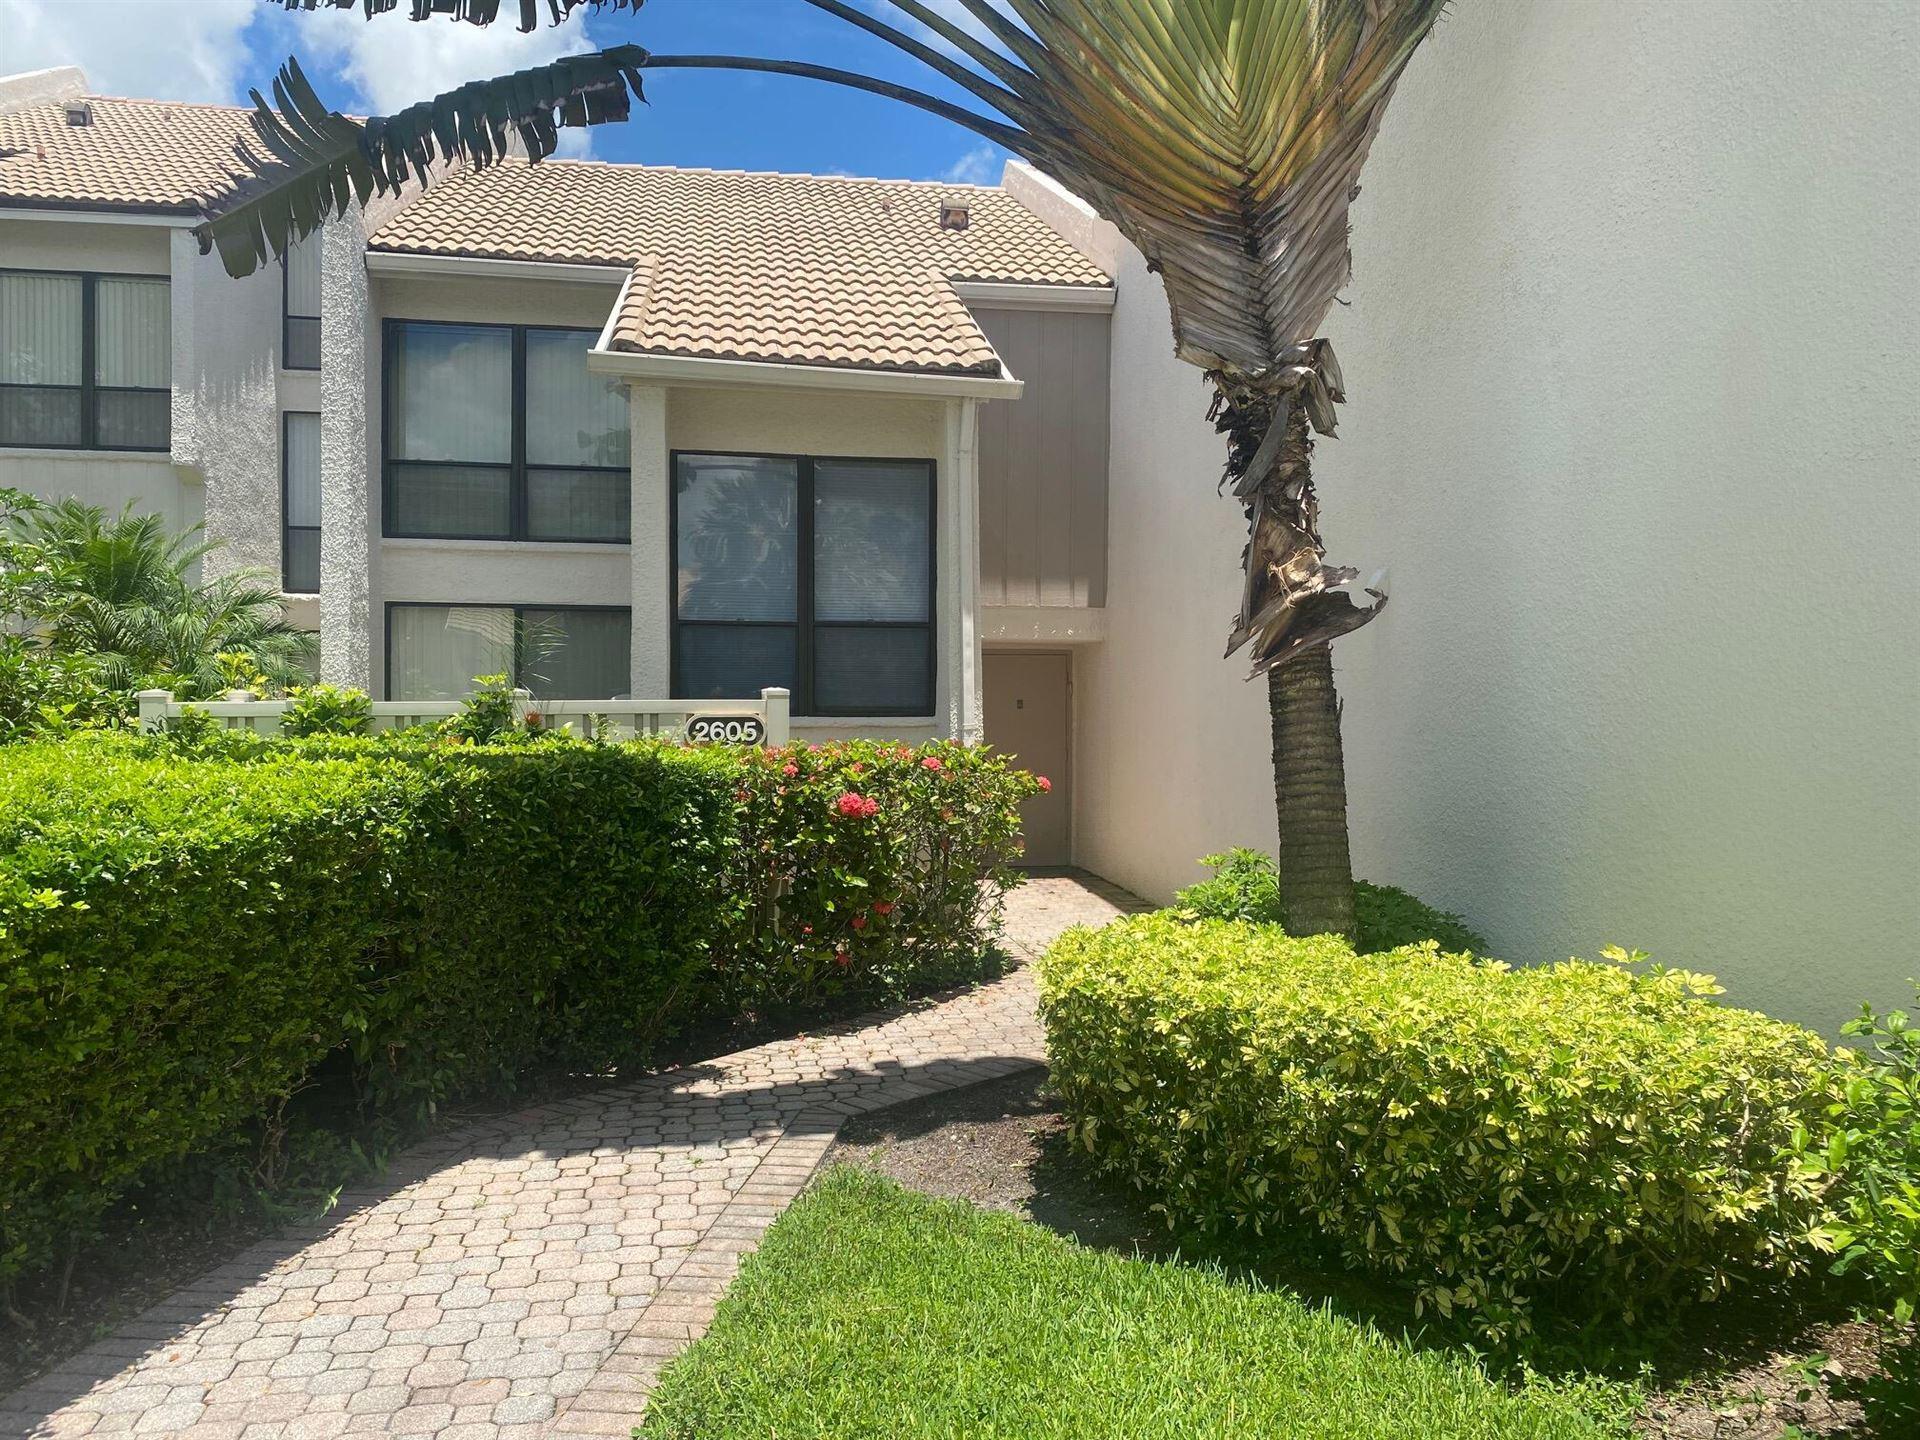 2605 Bridgewood Drive, Boca Raton, FL 33434 - #: RX-10731821